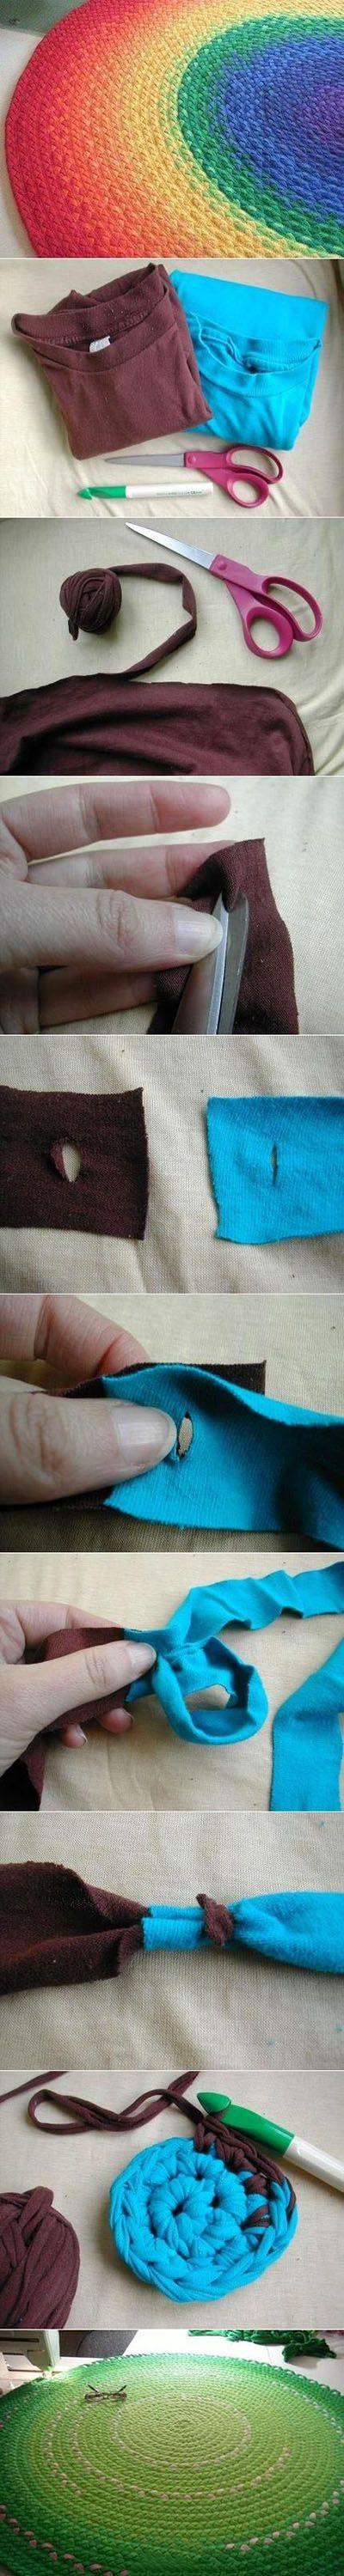 Colorful Craft | DIY & Crafts Tutorials